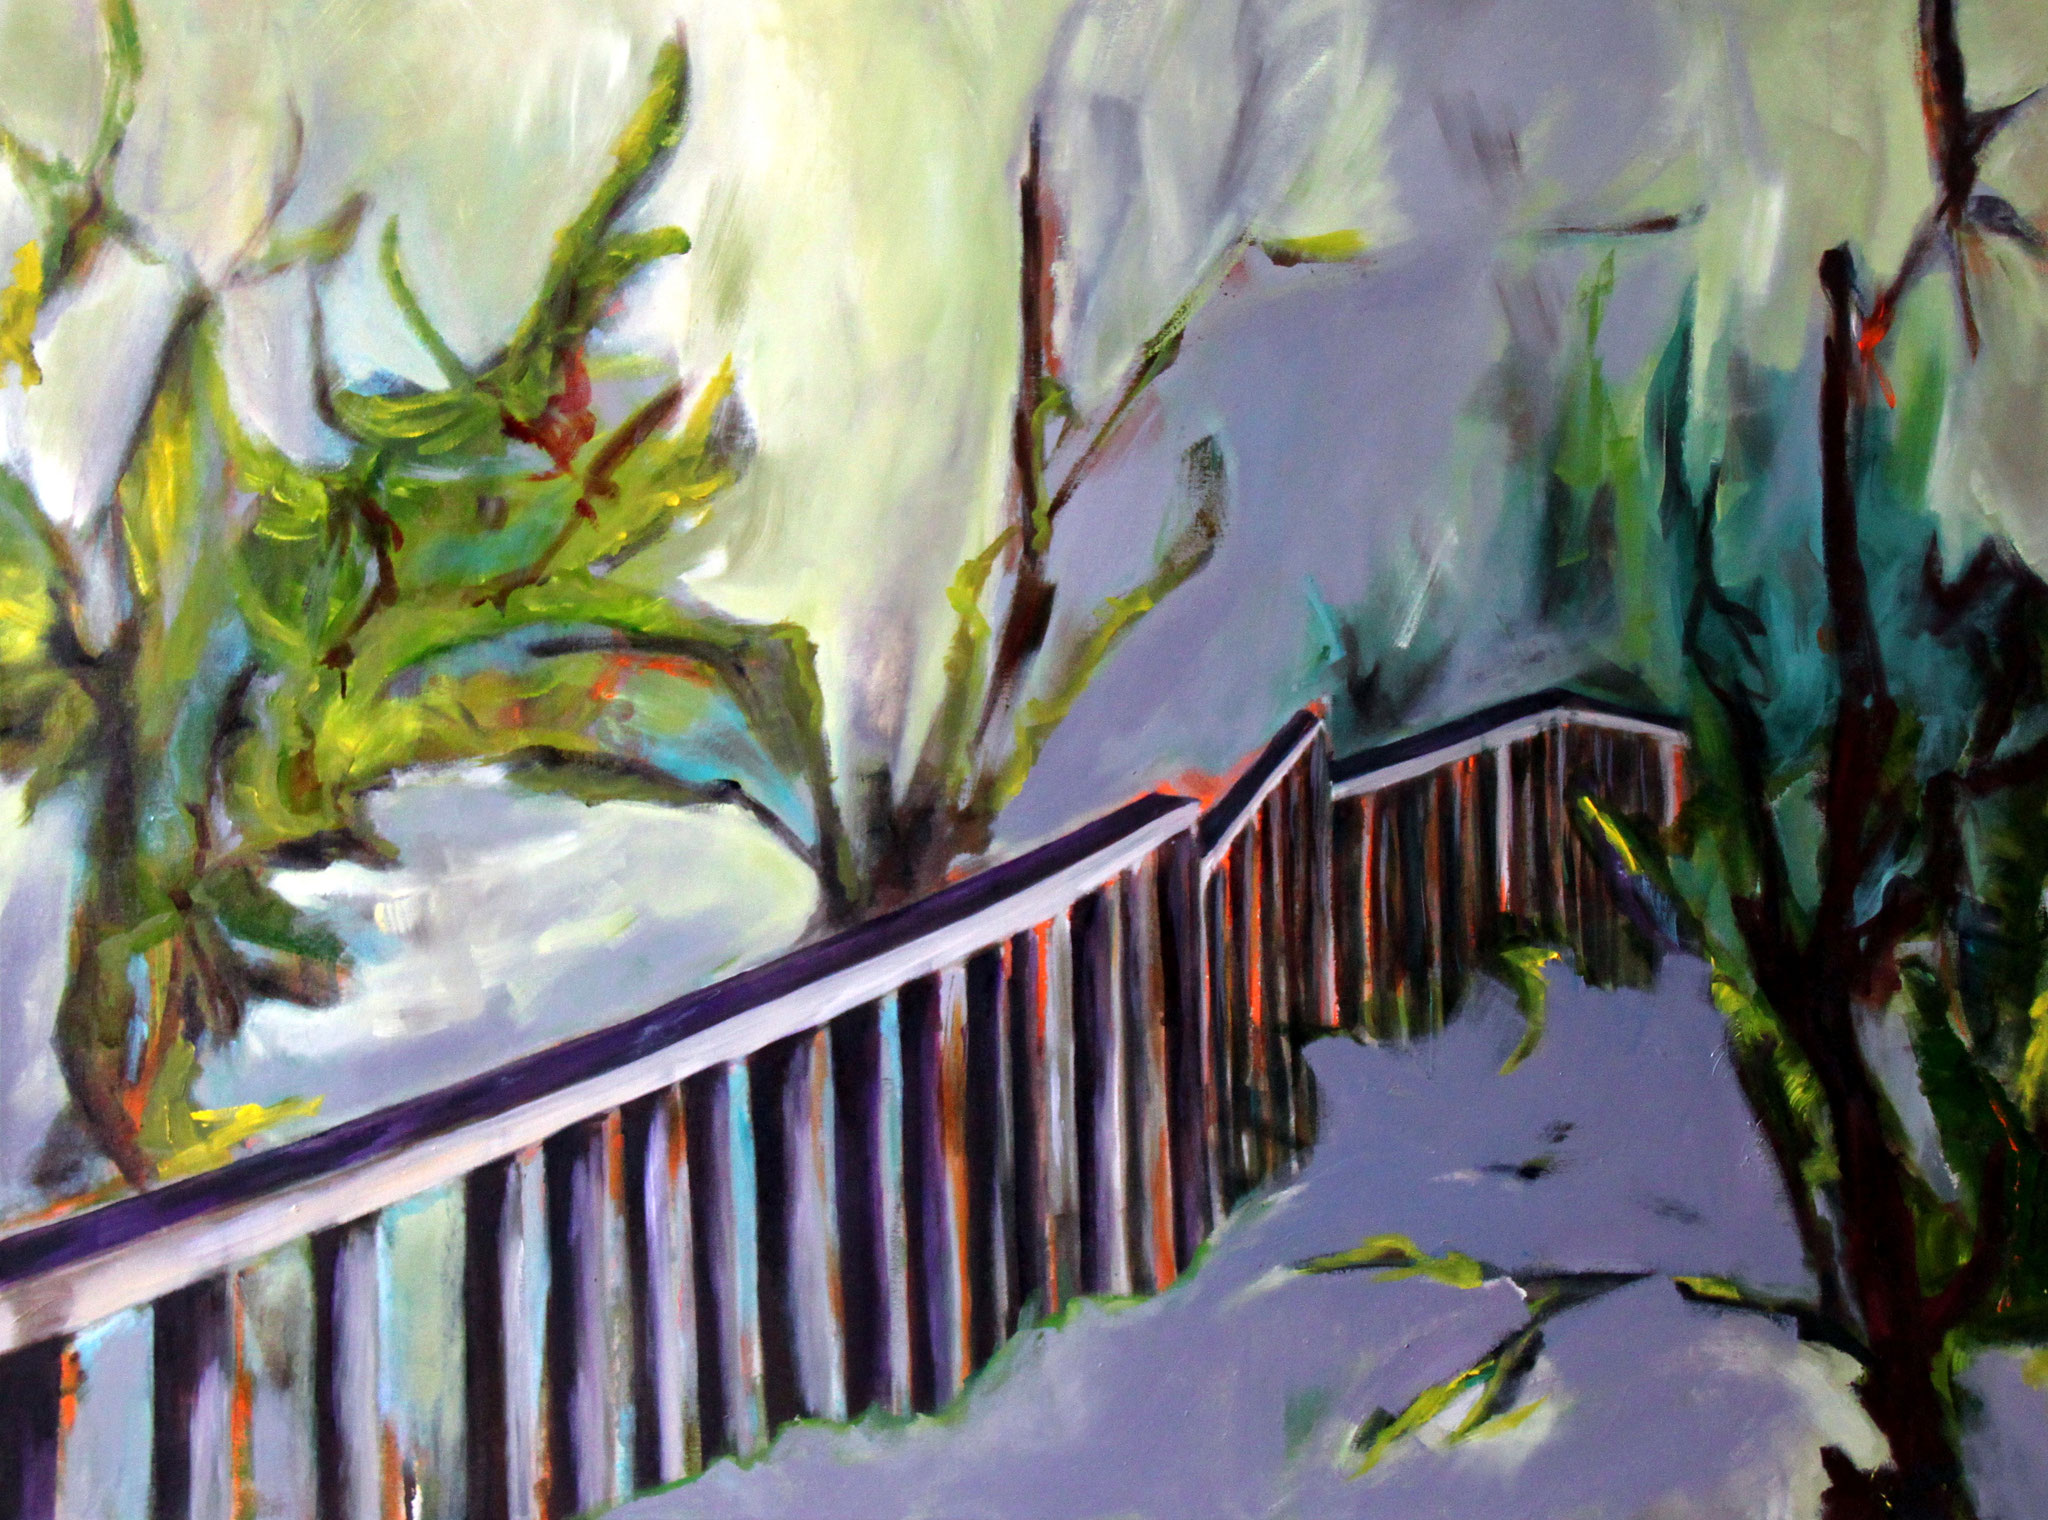 lost garden, 2010, 120 x 160 cm, Öl und Acryl a.L.